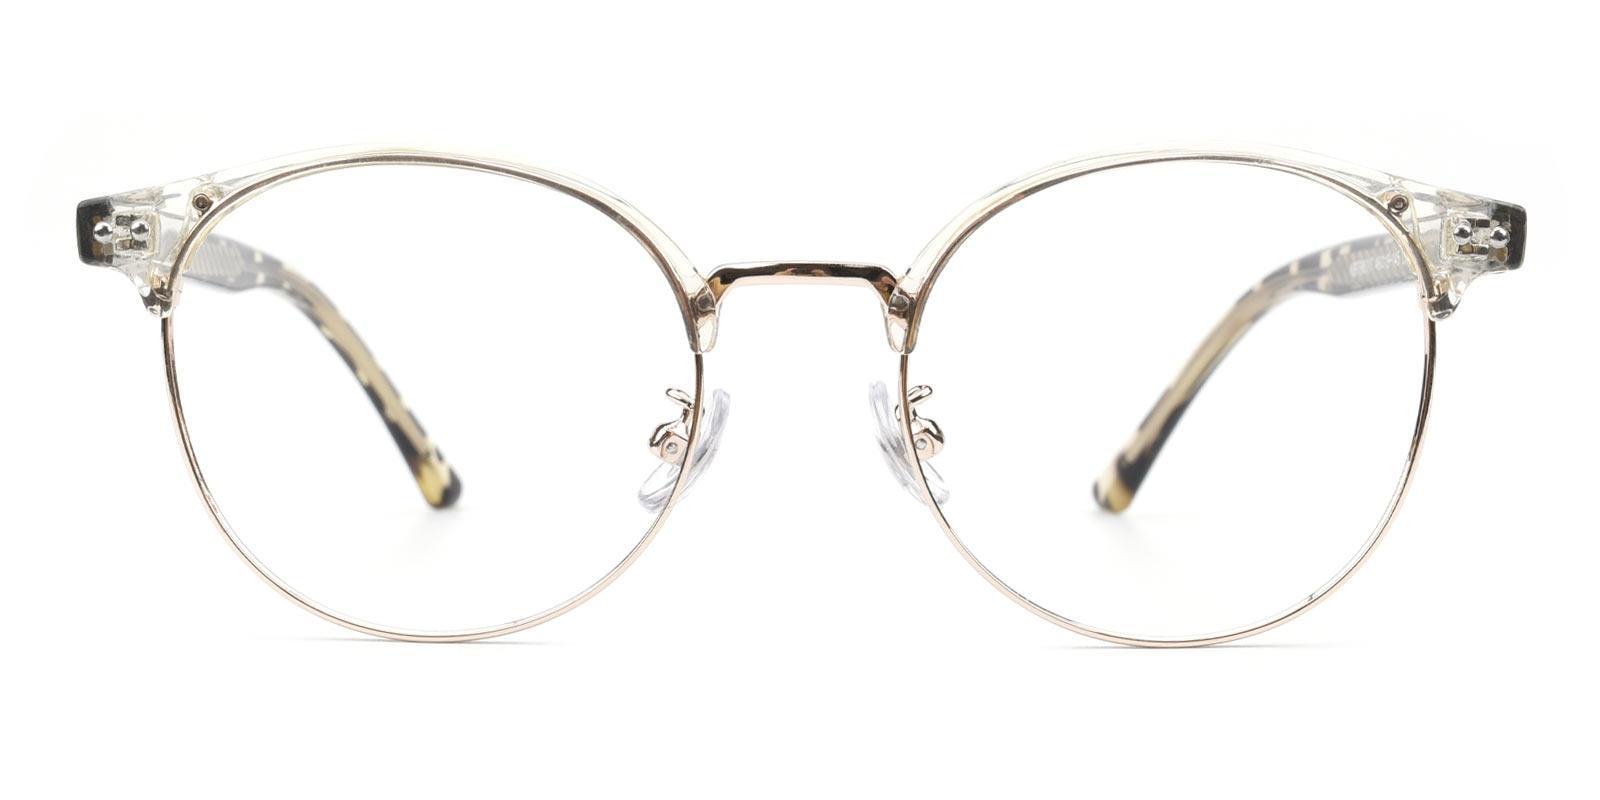 Badia-Tortoise-Browline-Combination-Eyeglasses-additional2